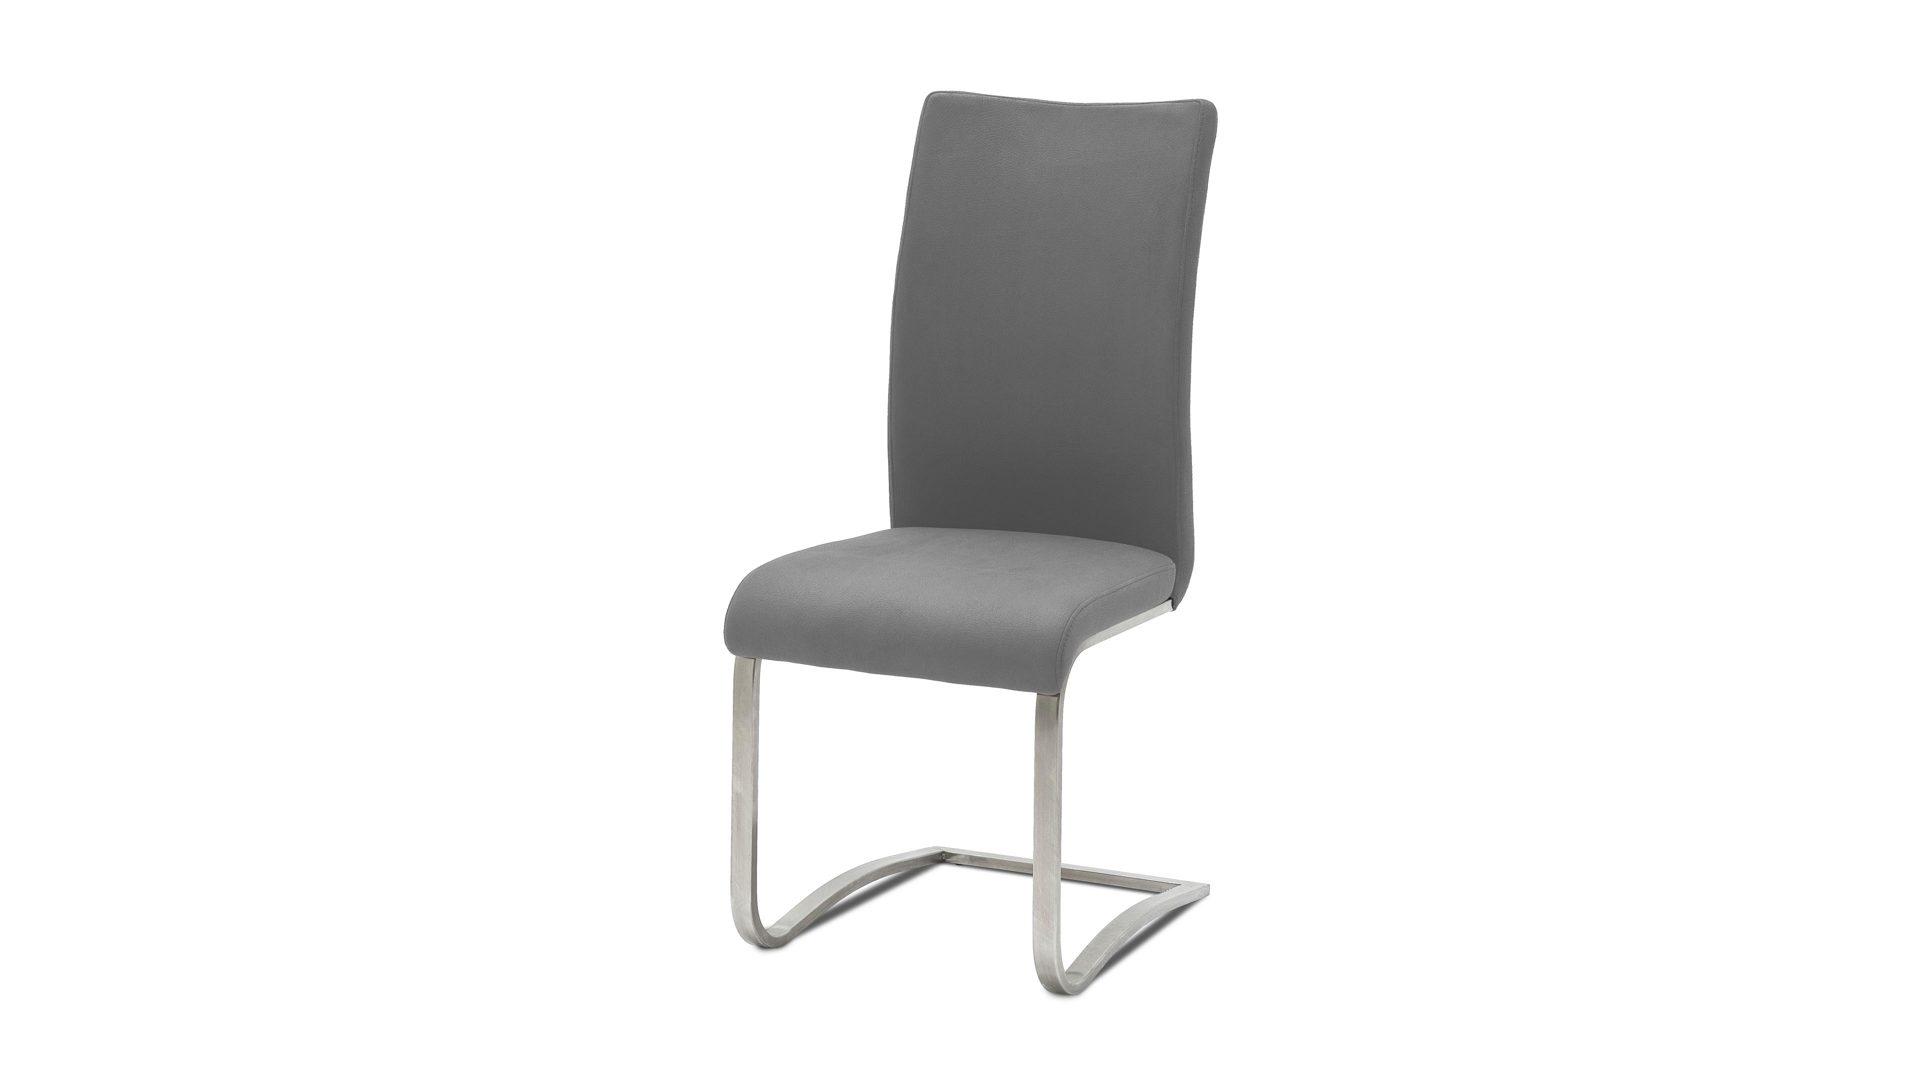 Möbel Bernskötter Mülheim | Markenshops | Stühle + Tische | Leder ...